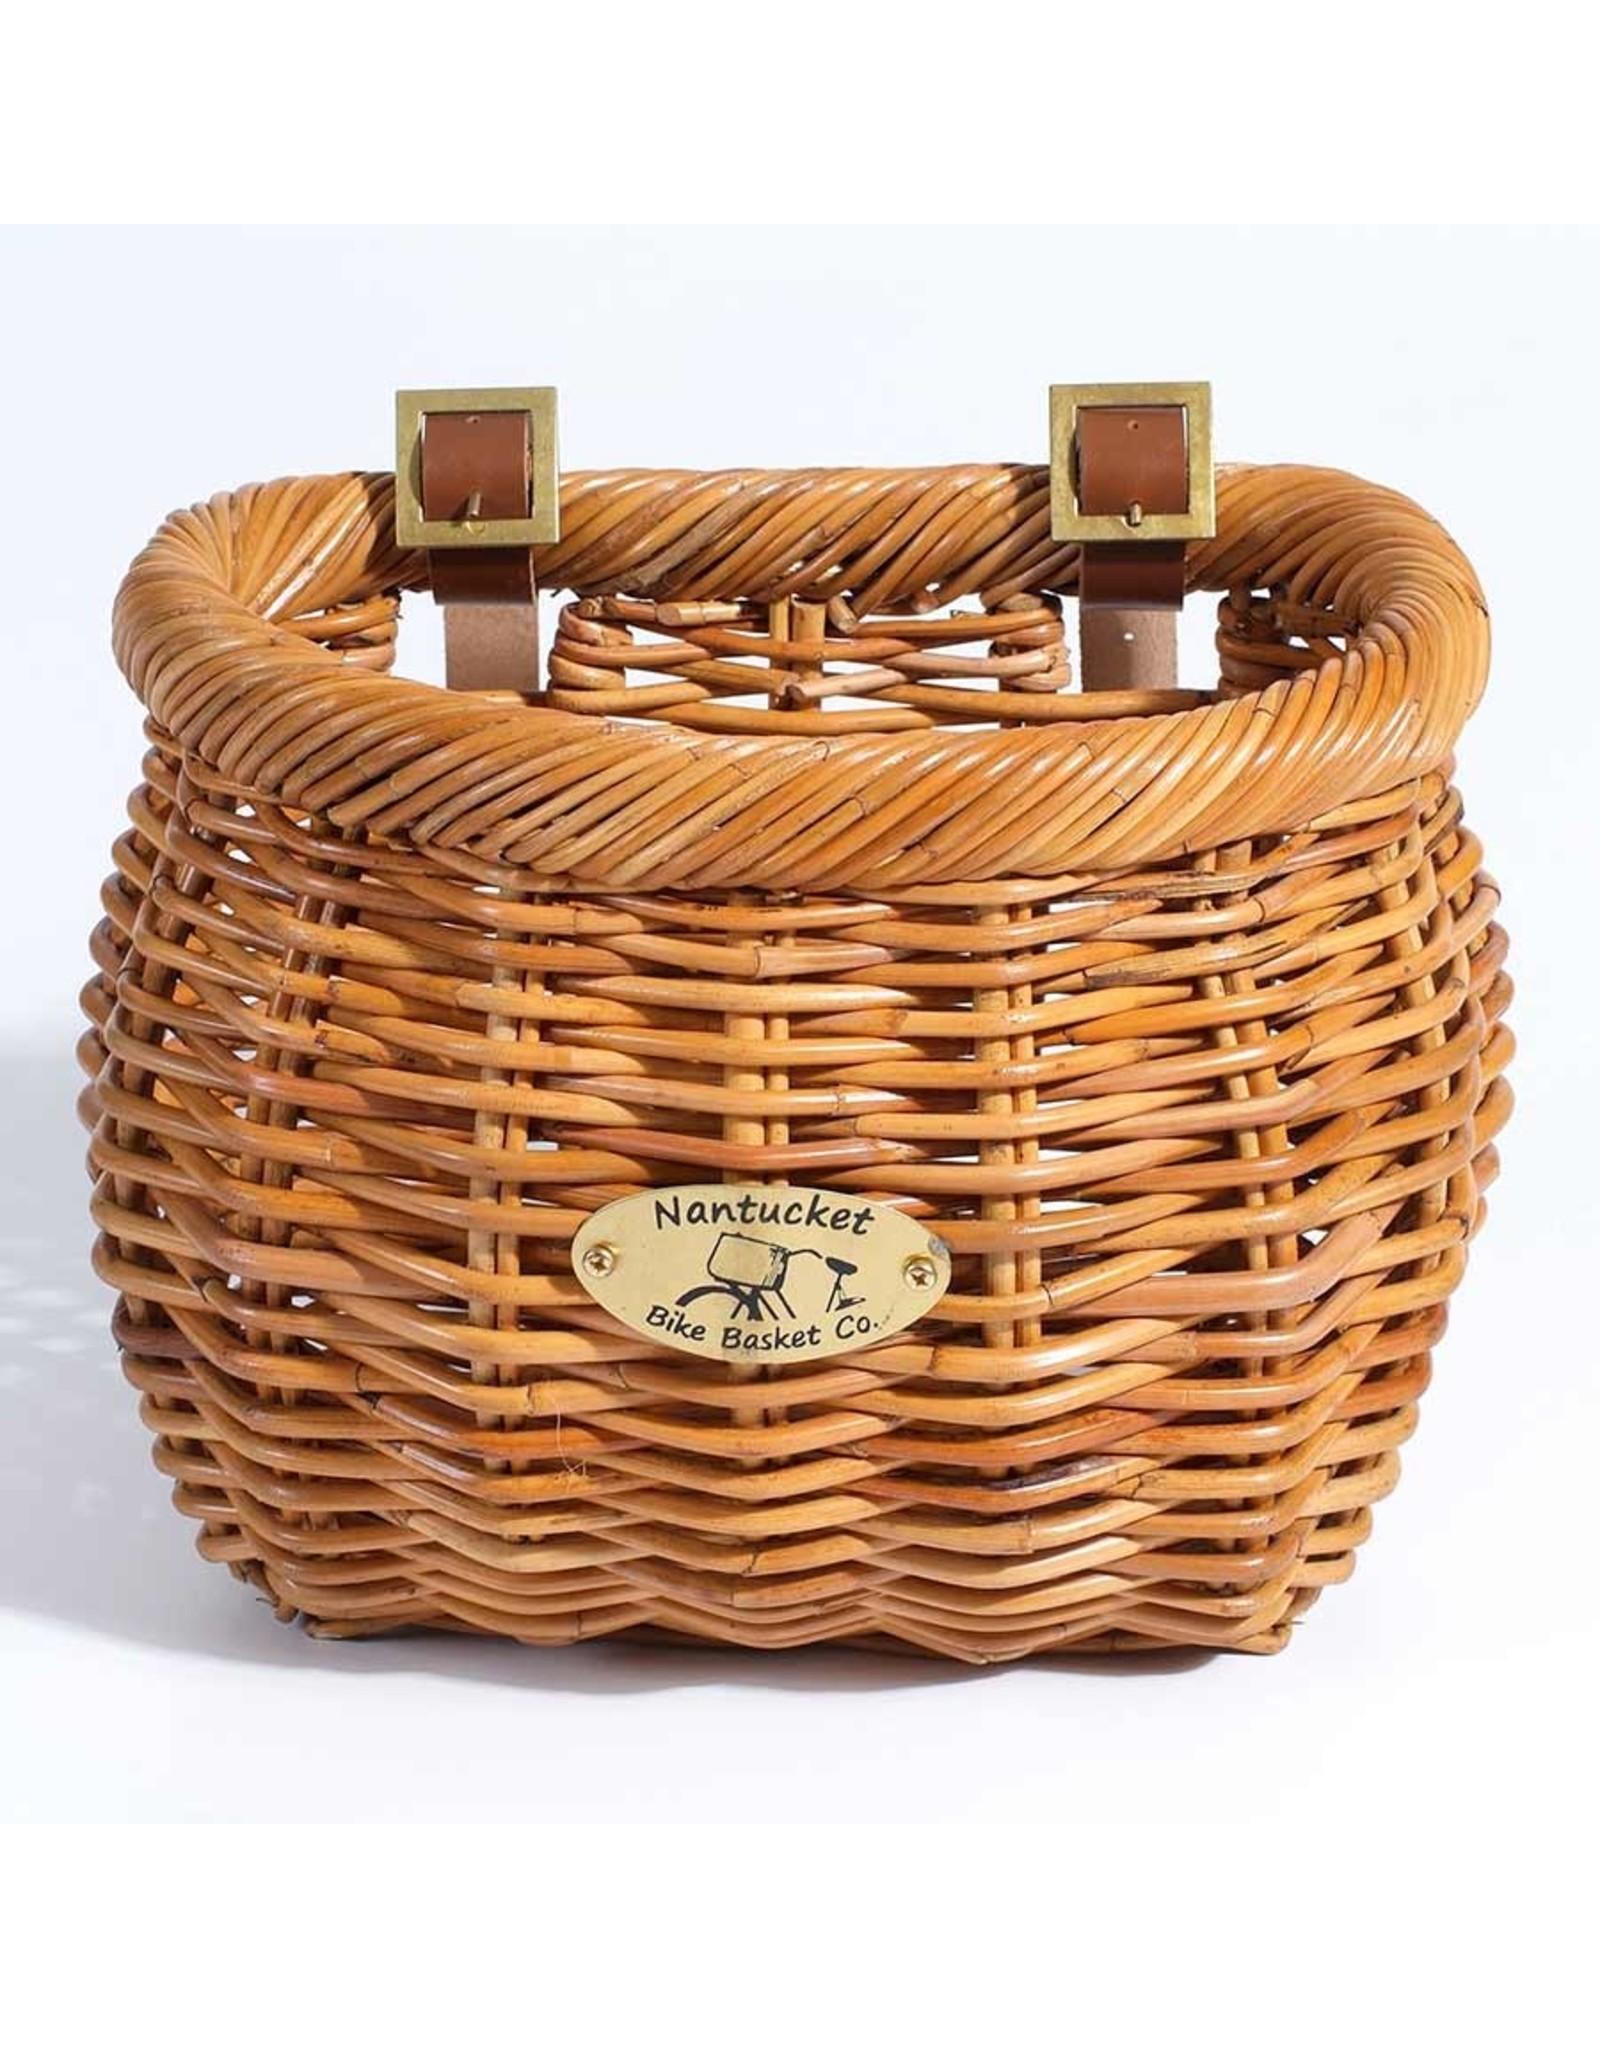 Nantucket, Cisco, Classic basket, 14''x11''x9.5''